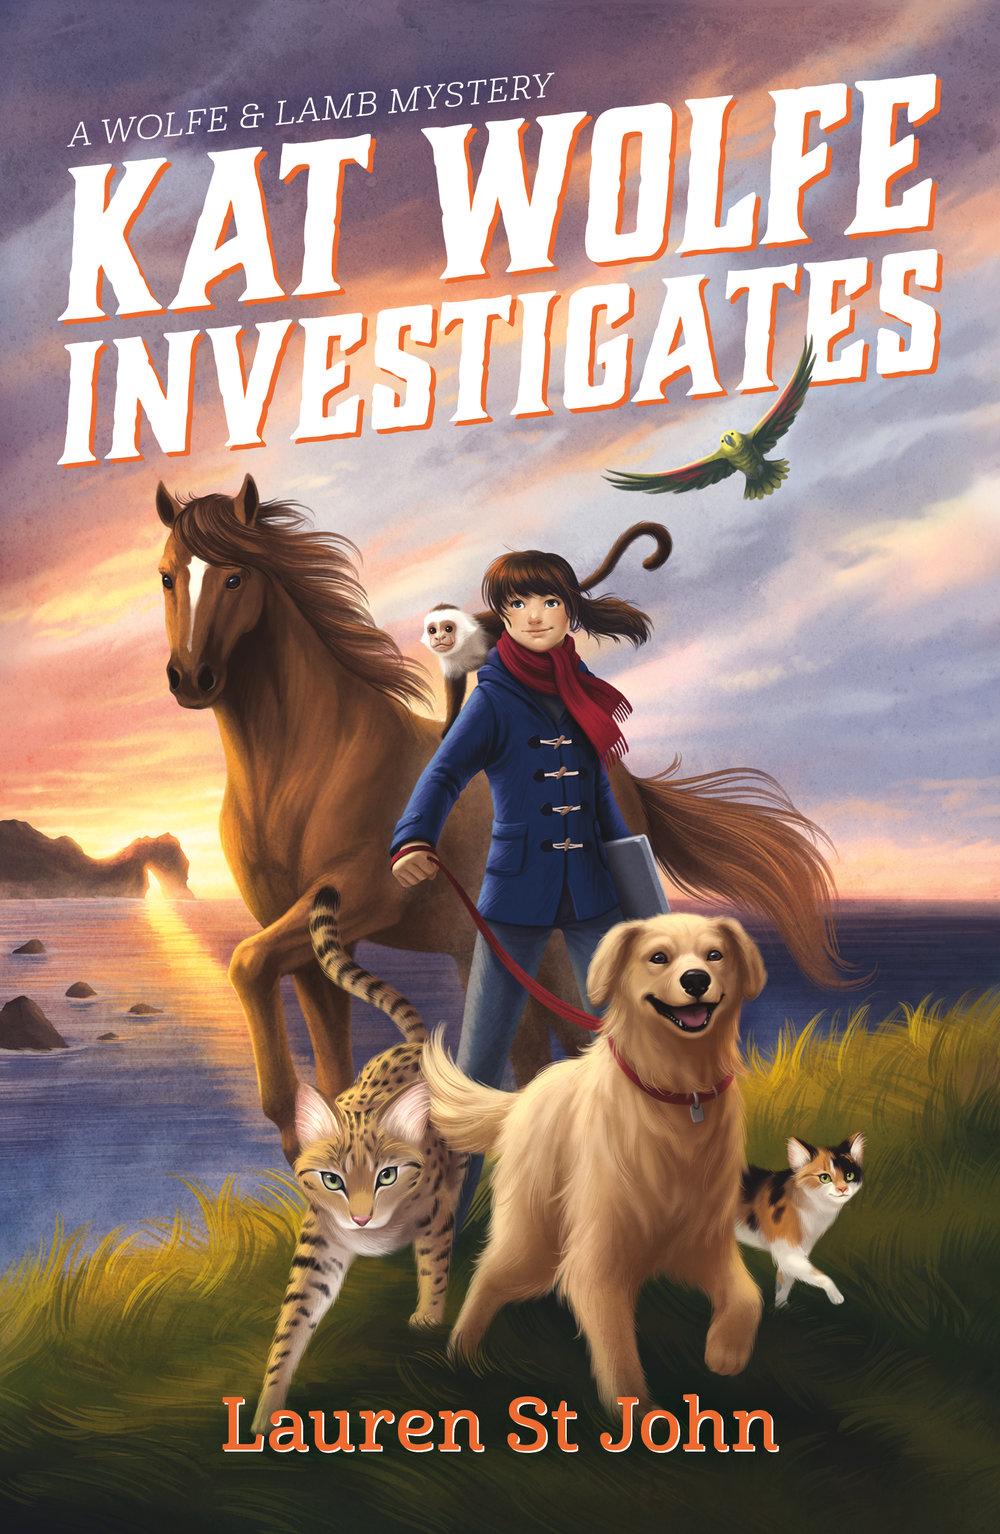 Kat Wolfe Investigates , Lauren St John  For Farrar, Straus and Giroux BYR. Illustration by  Vivienne To .